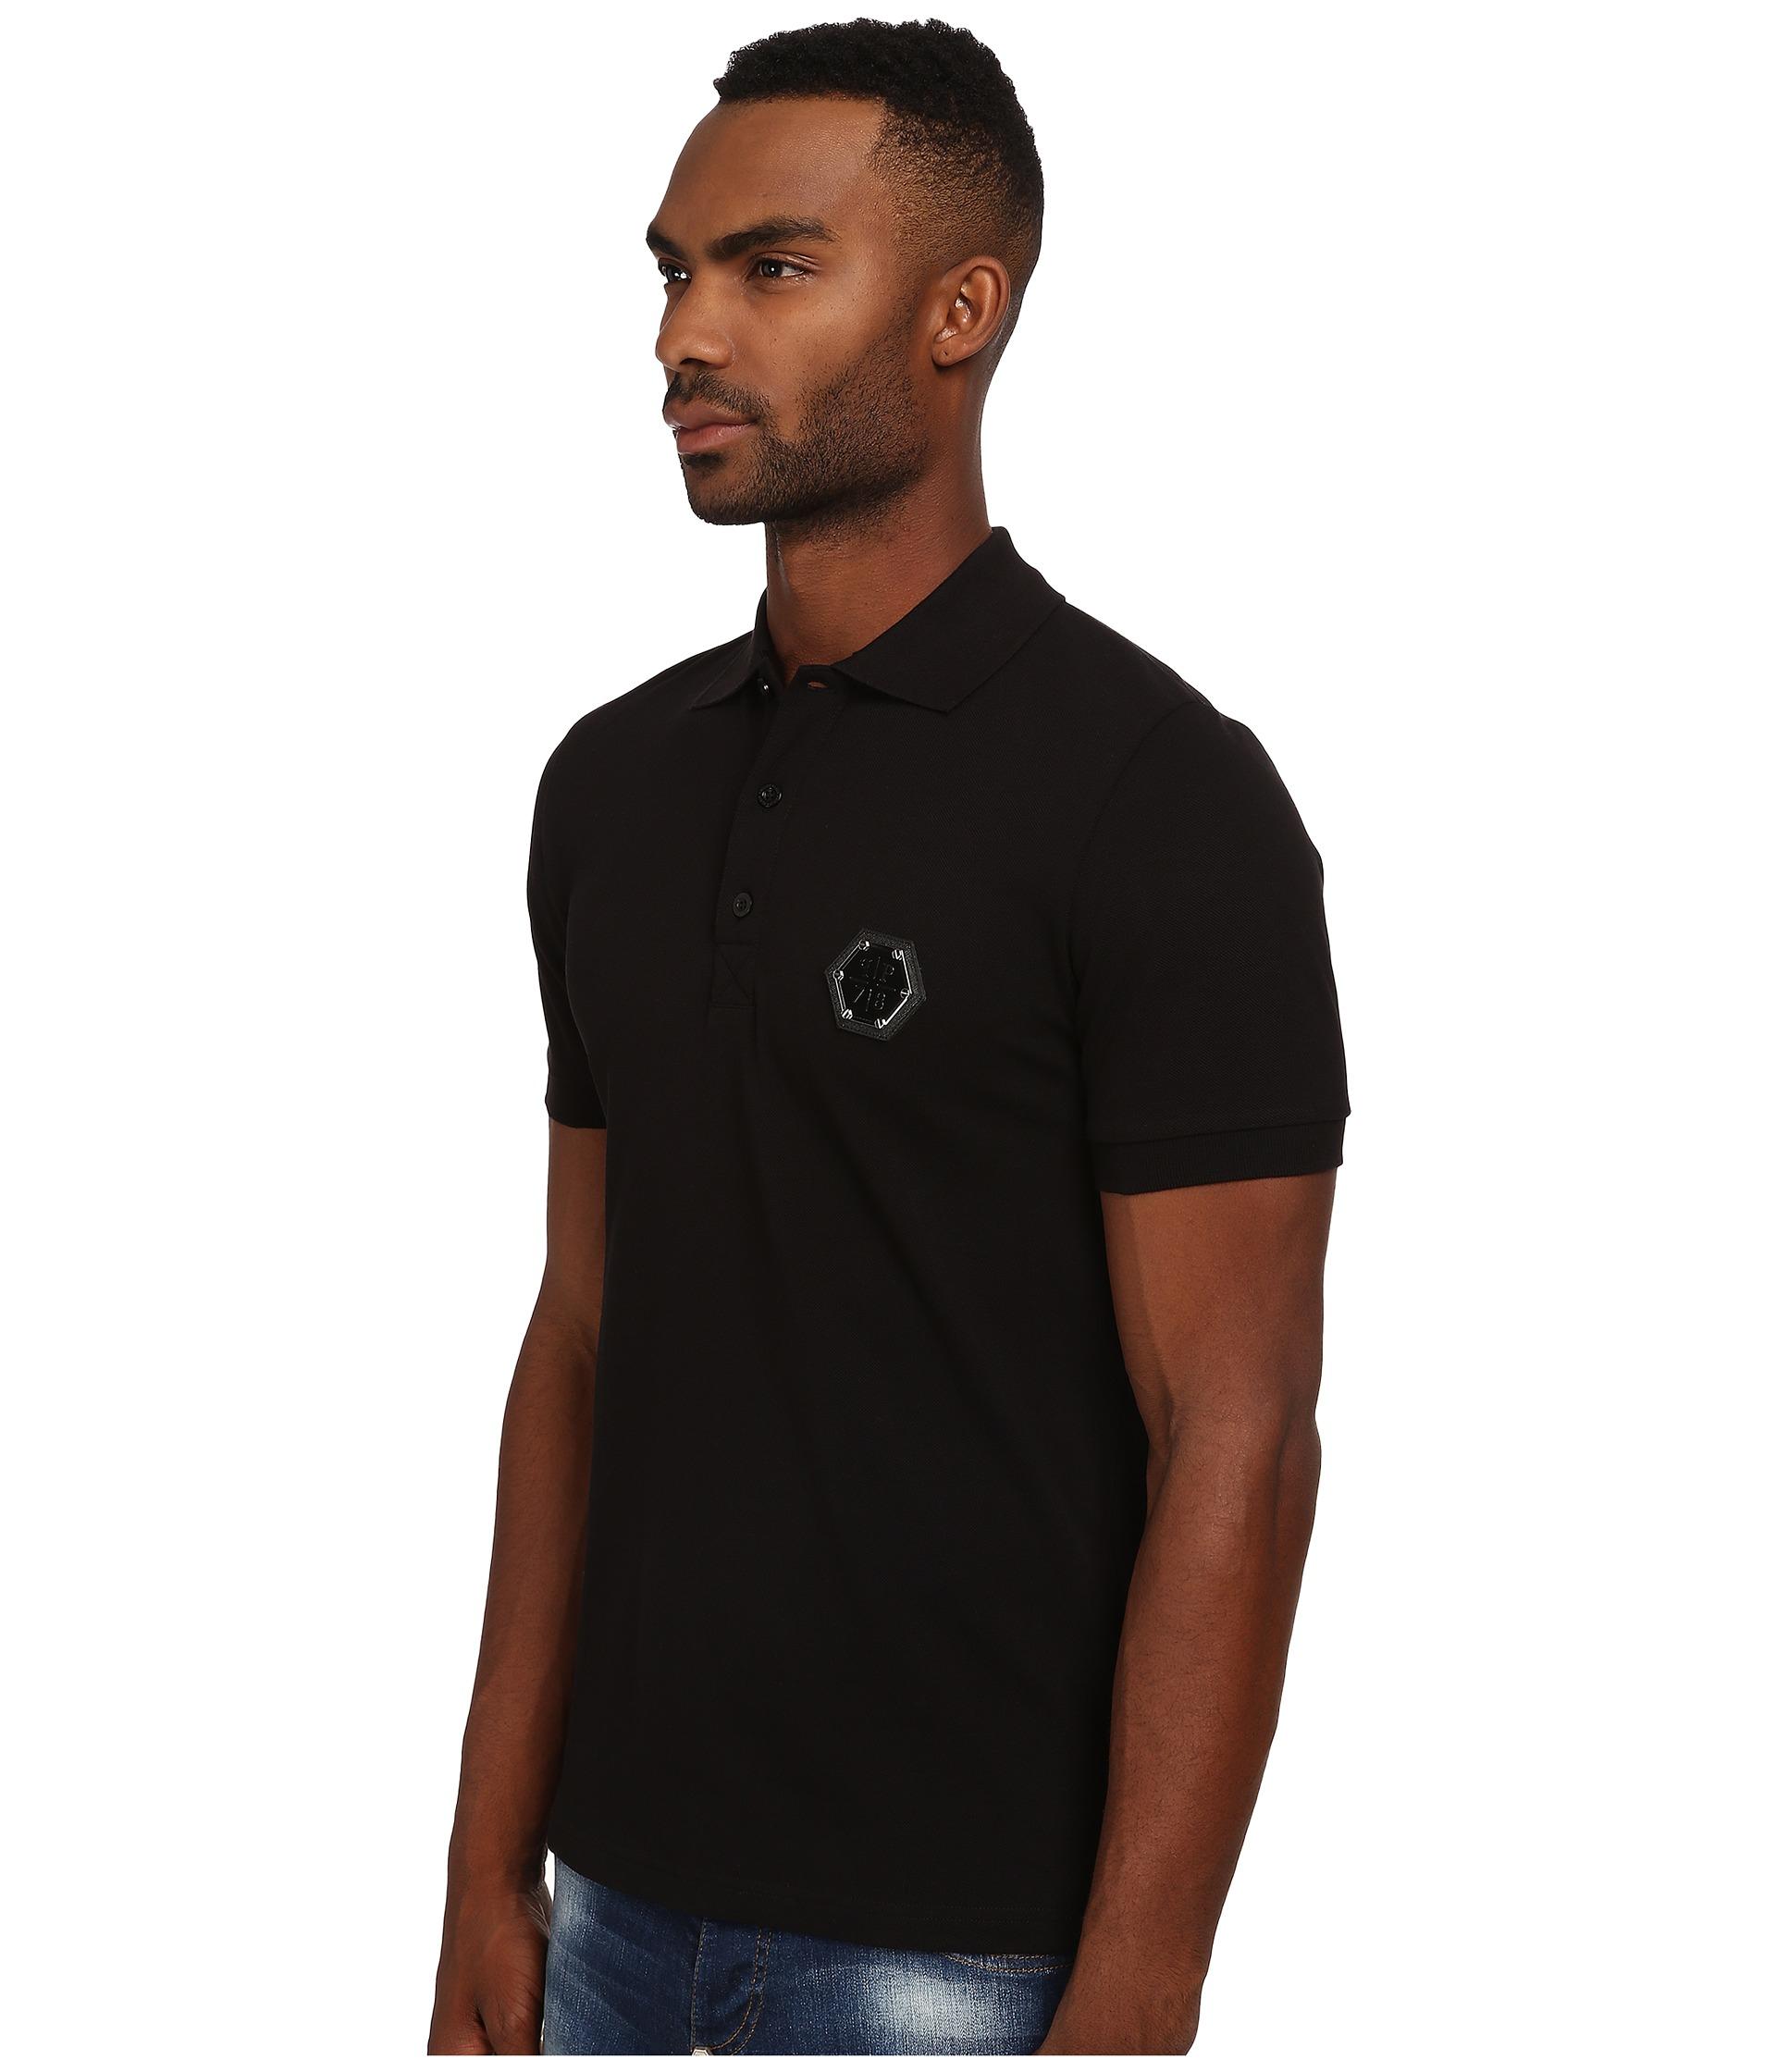 Philipp Plein Schoudertasje : Philipp plein t shirt in black for men lyst